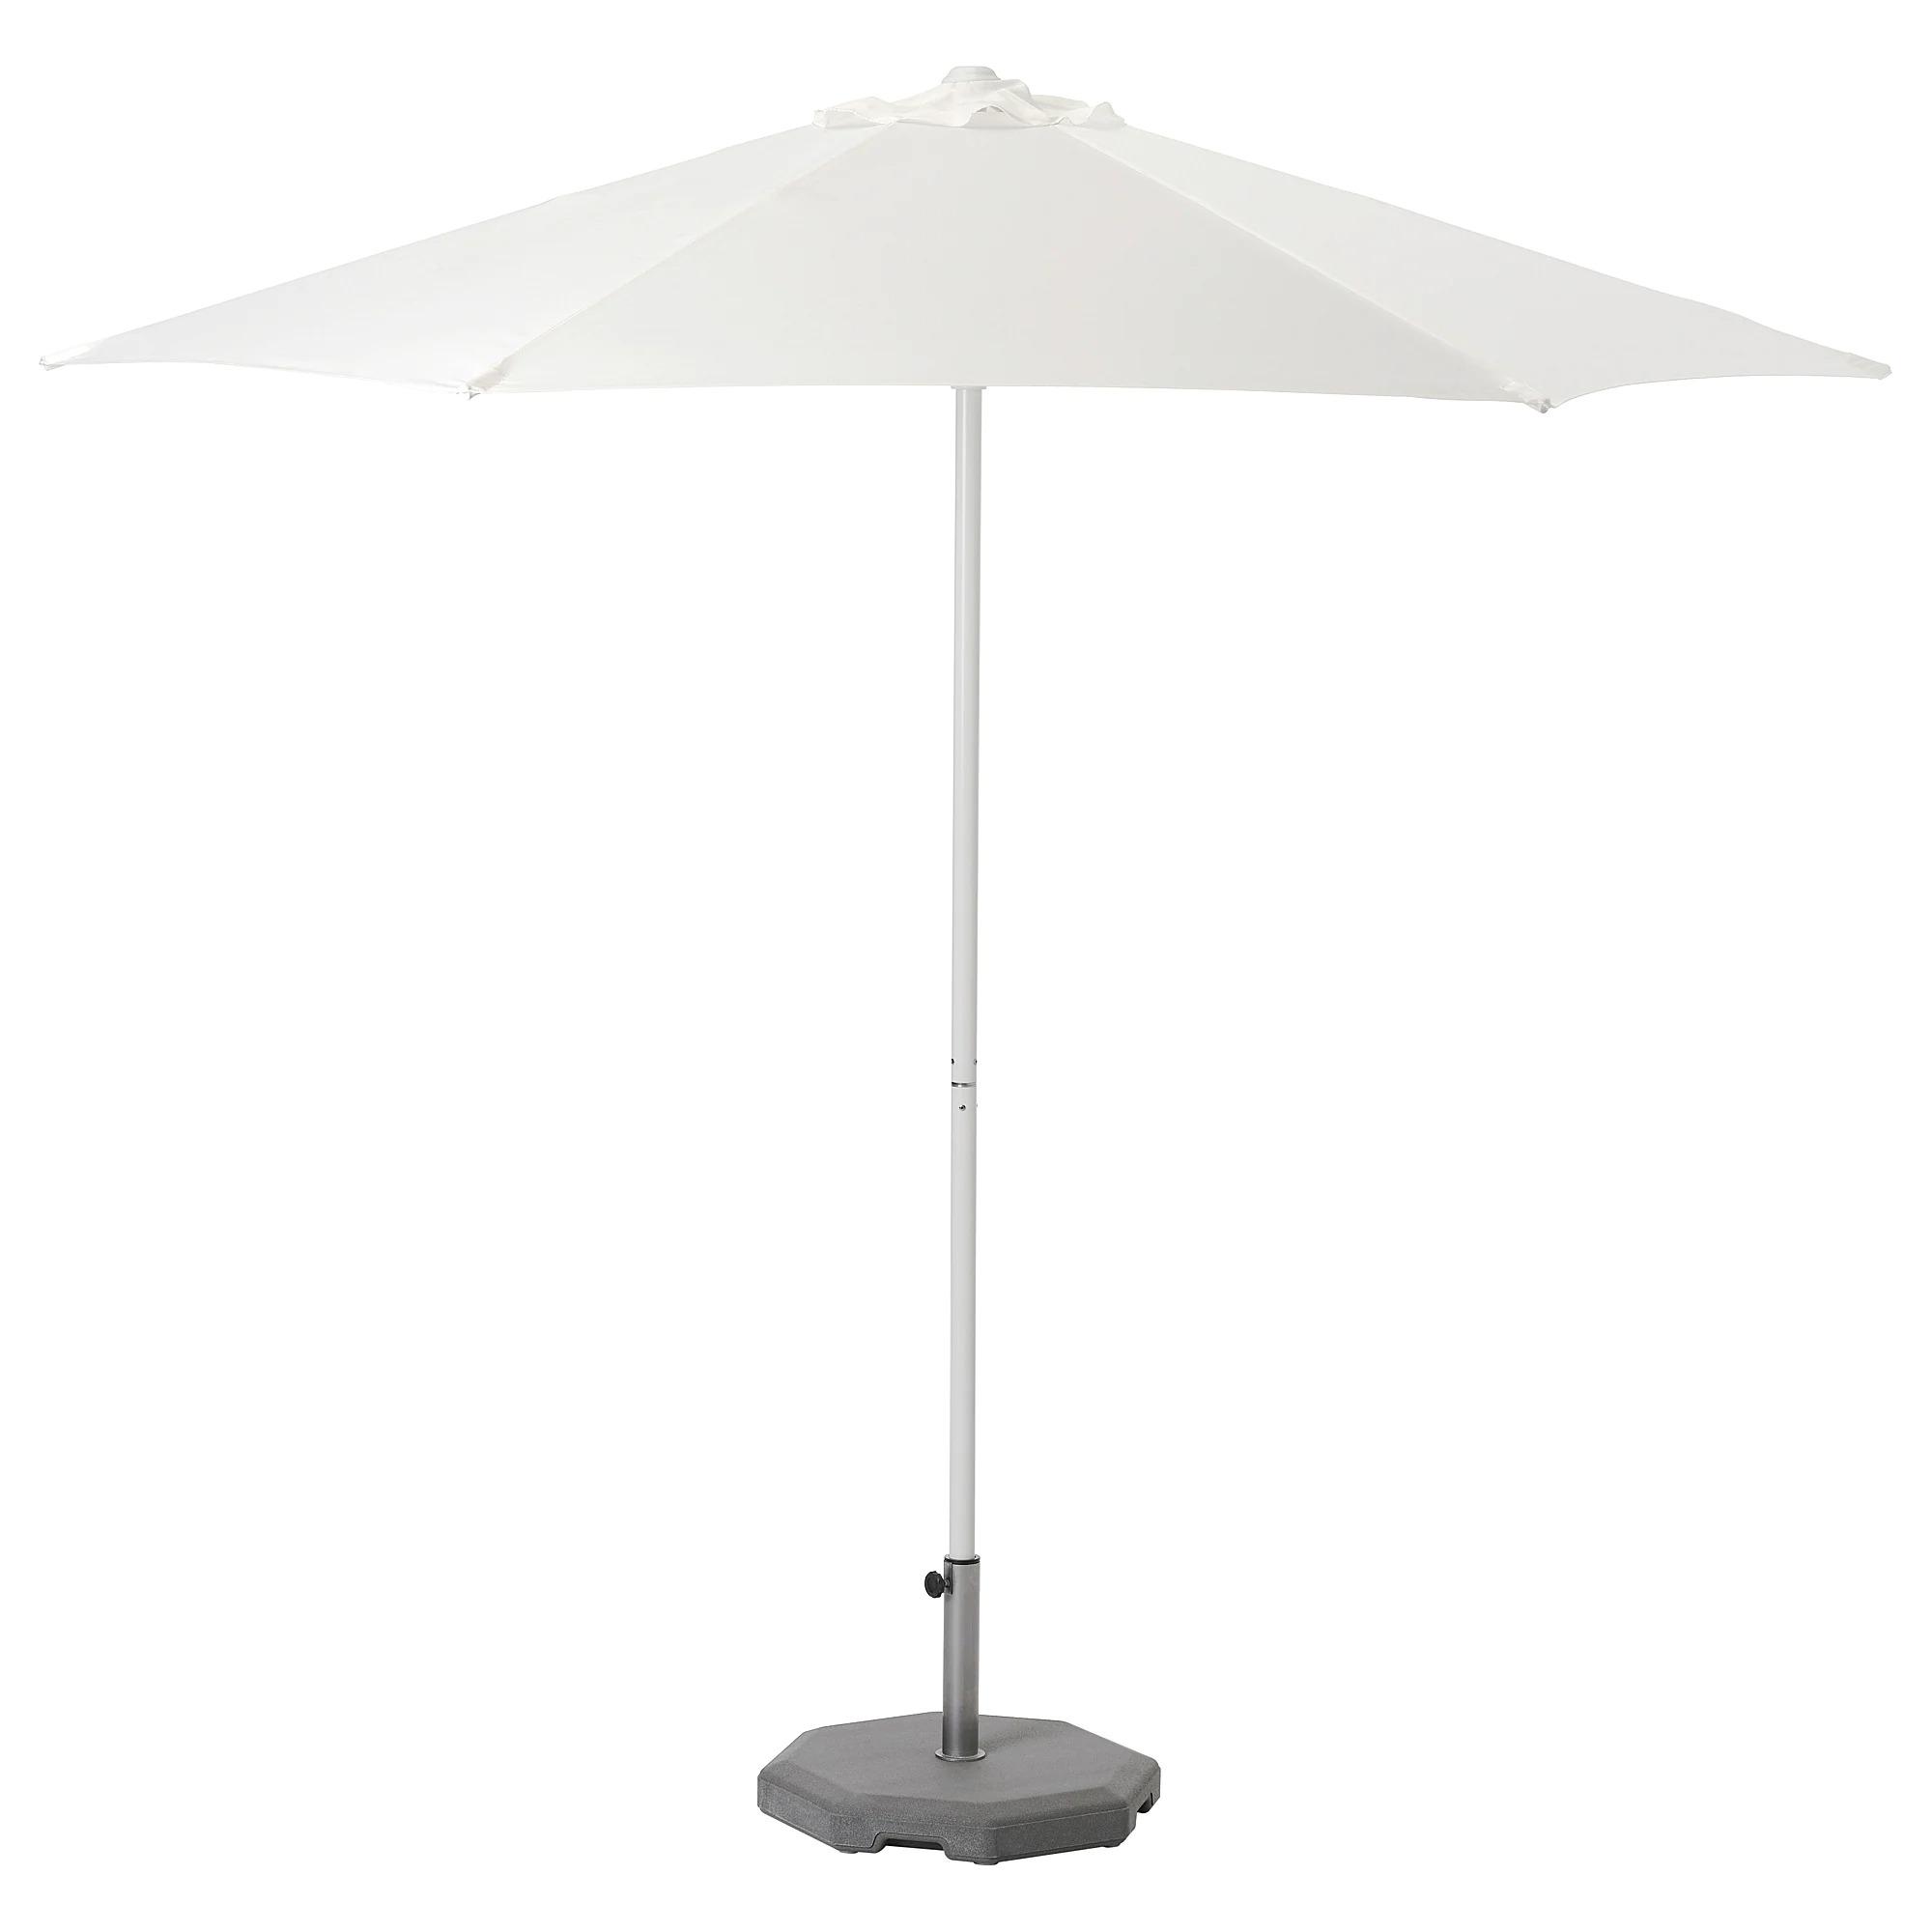 HÖGÖN Sombrilla con soporte, blanco/Huvön gris oscuro 270 cm